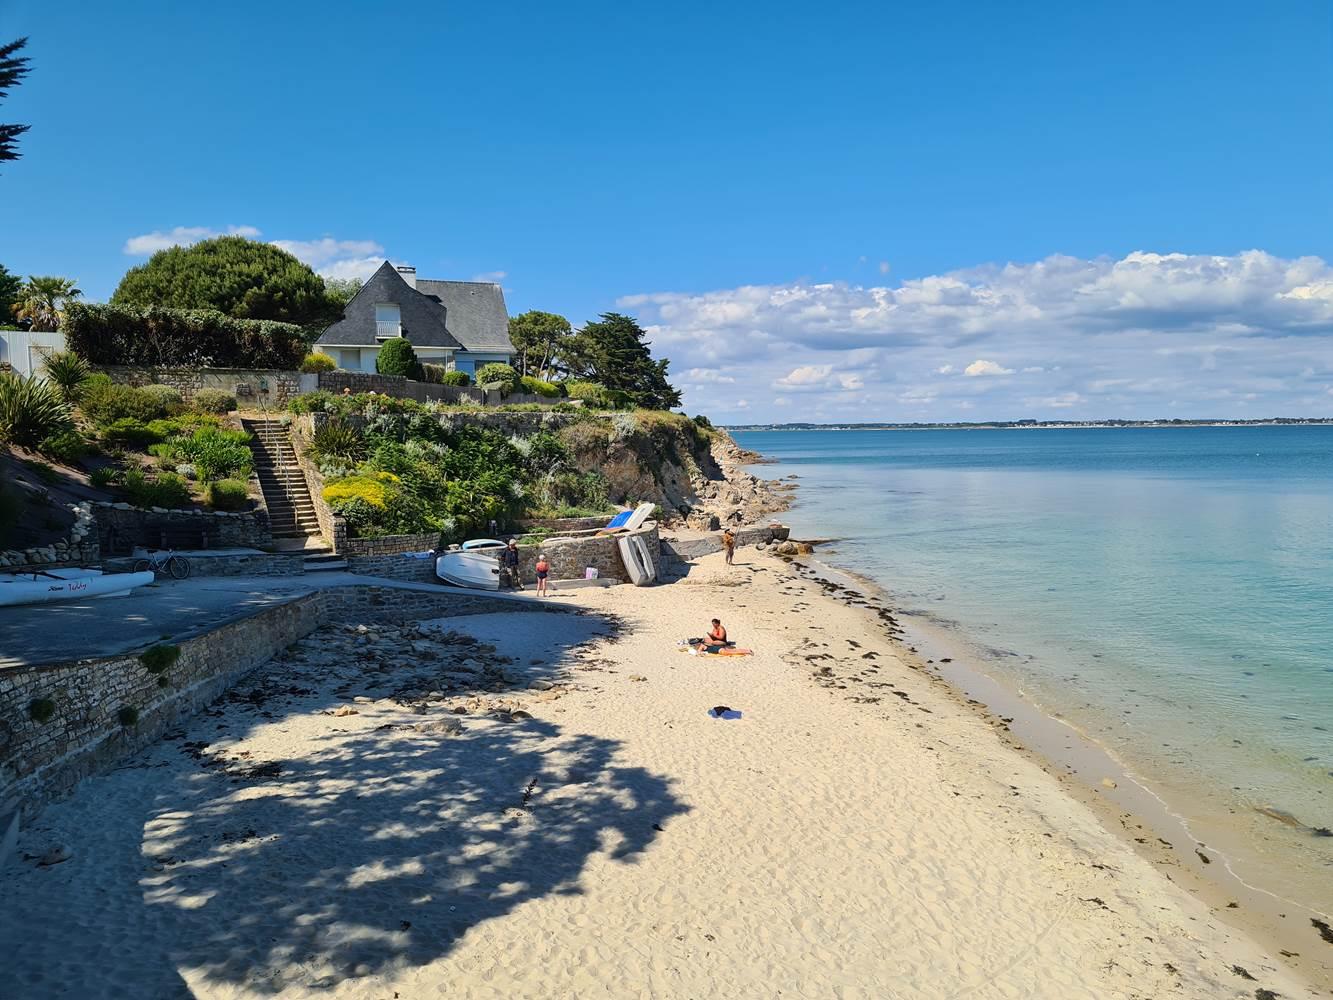 kerhostin-plage-st-pierre-quiberon ©Laurence Roger ©